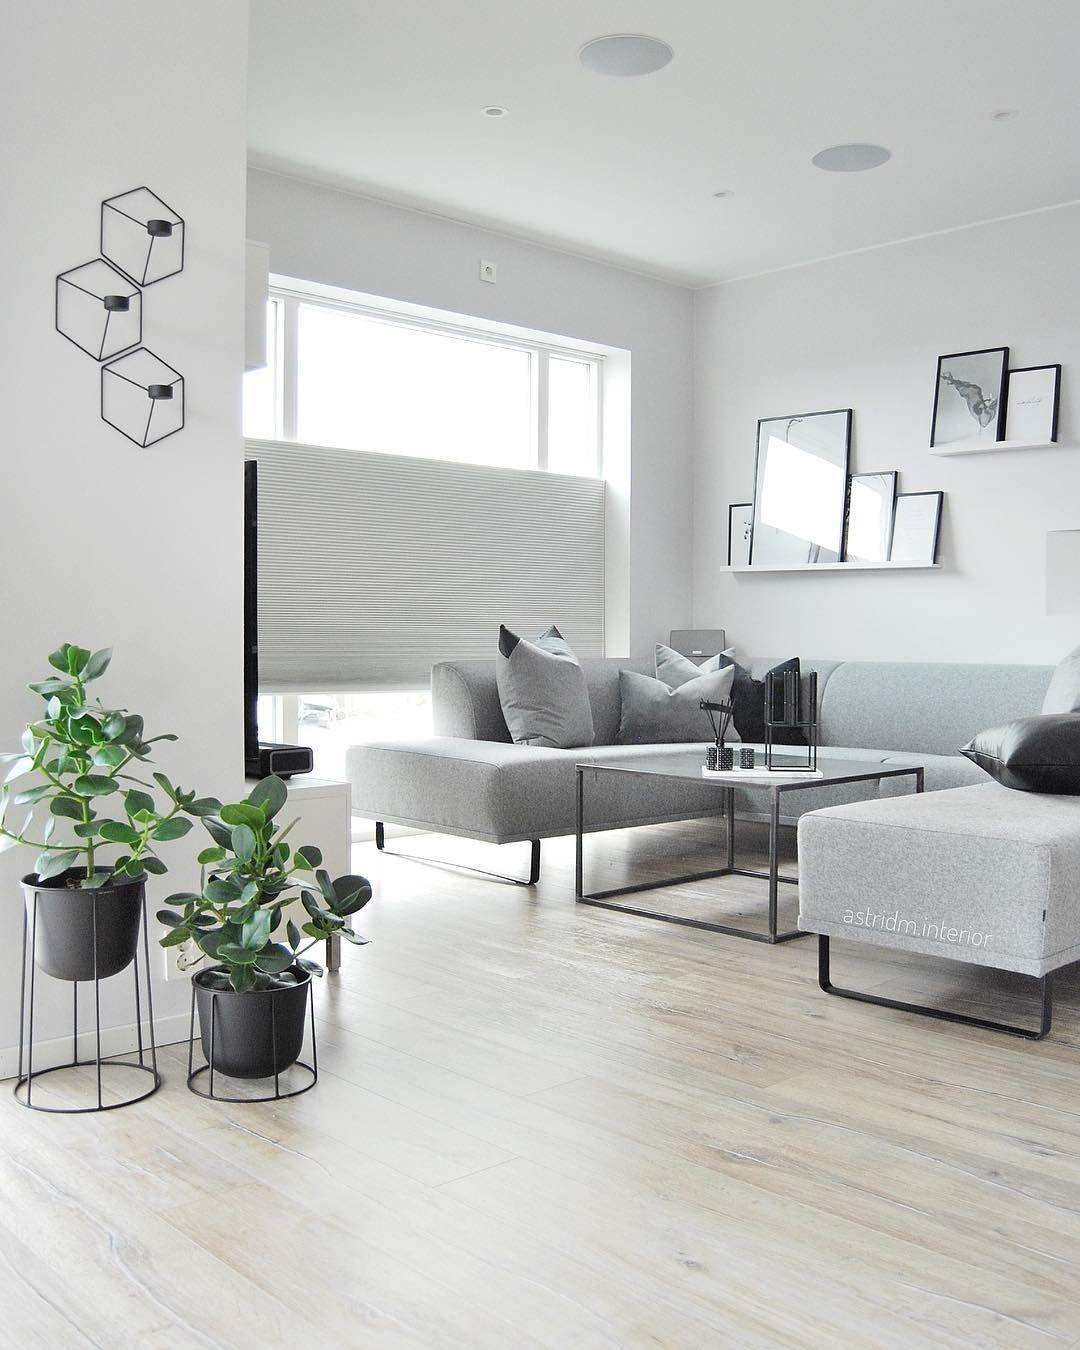 stunning scandinavian design interiors coffee interior living room designs decor also rh pinterest